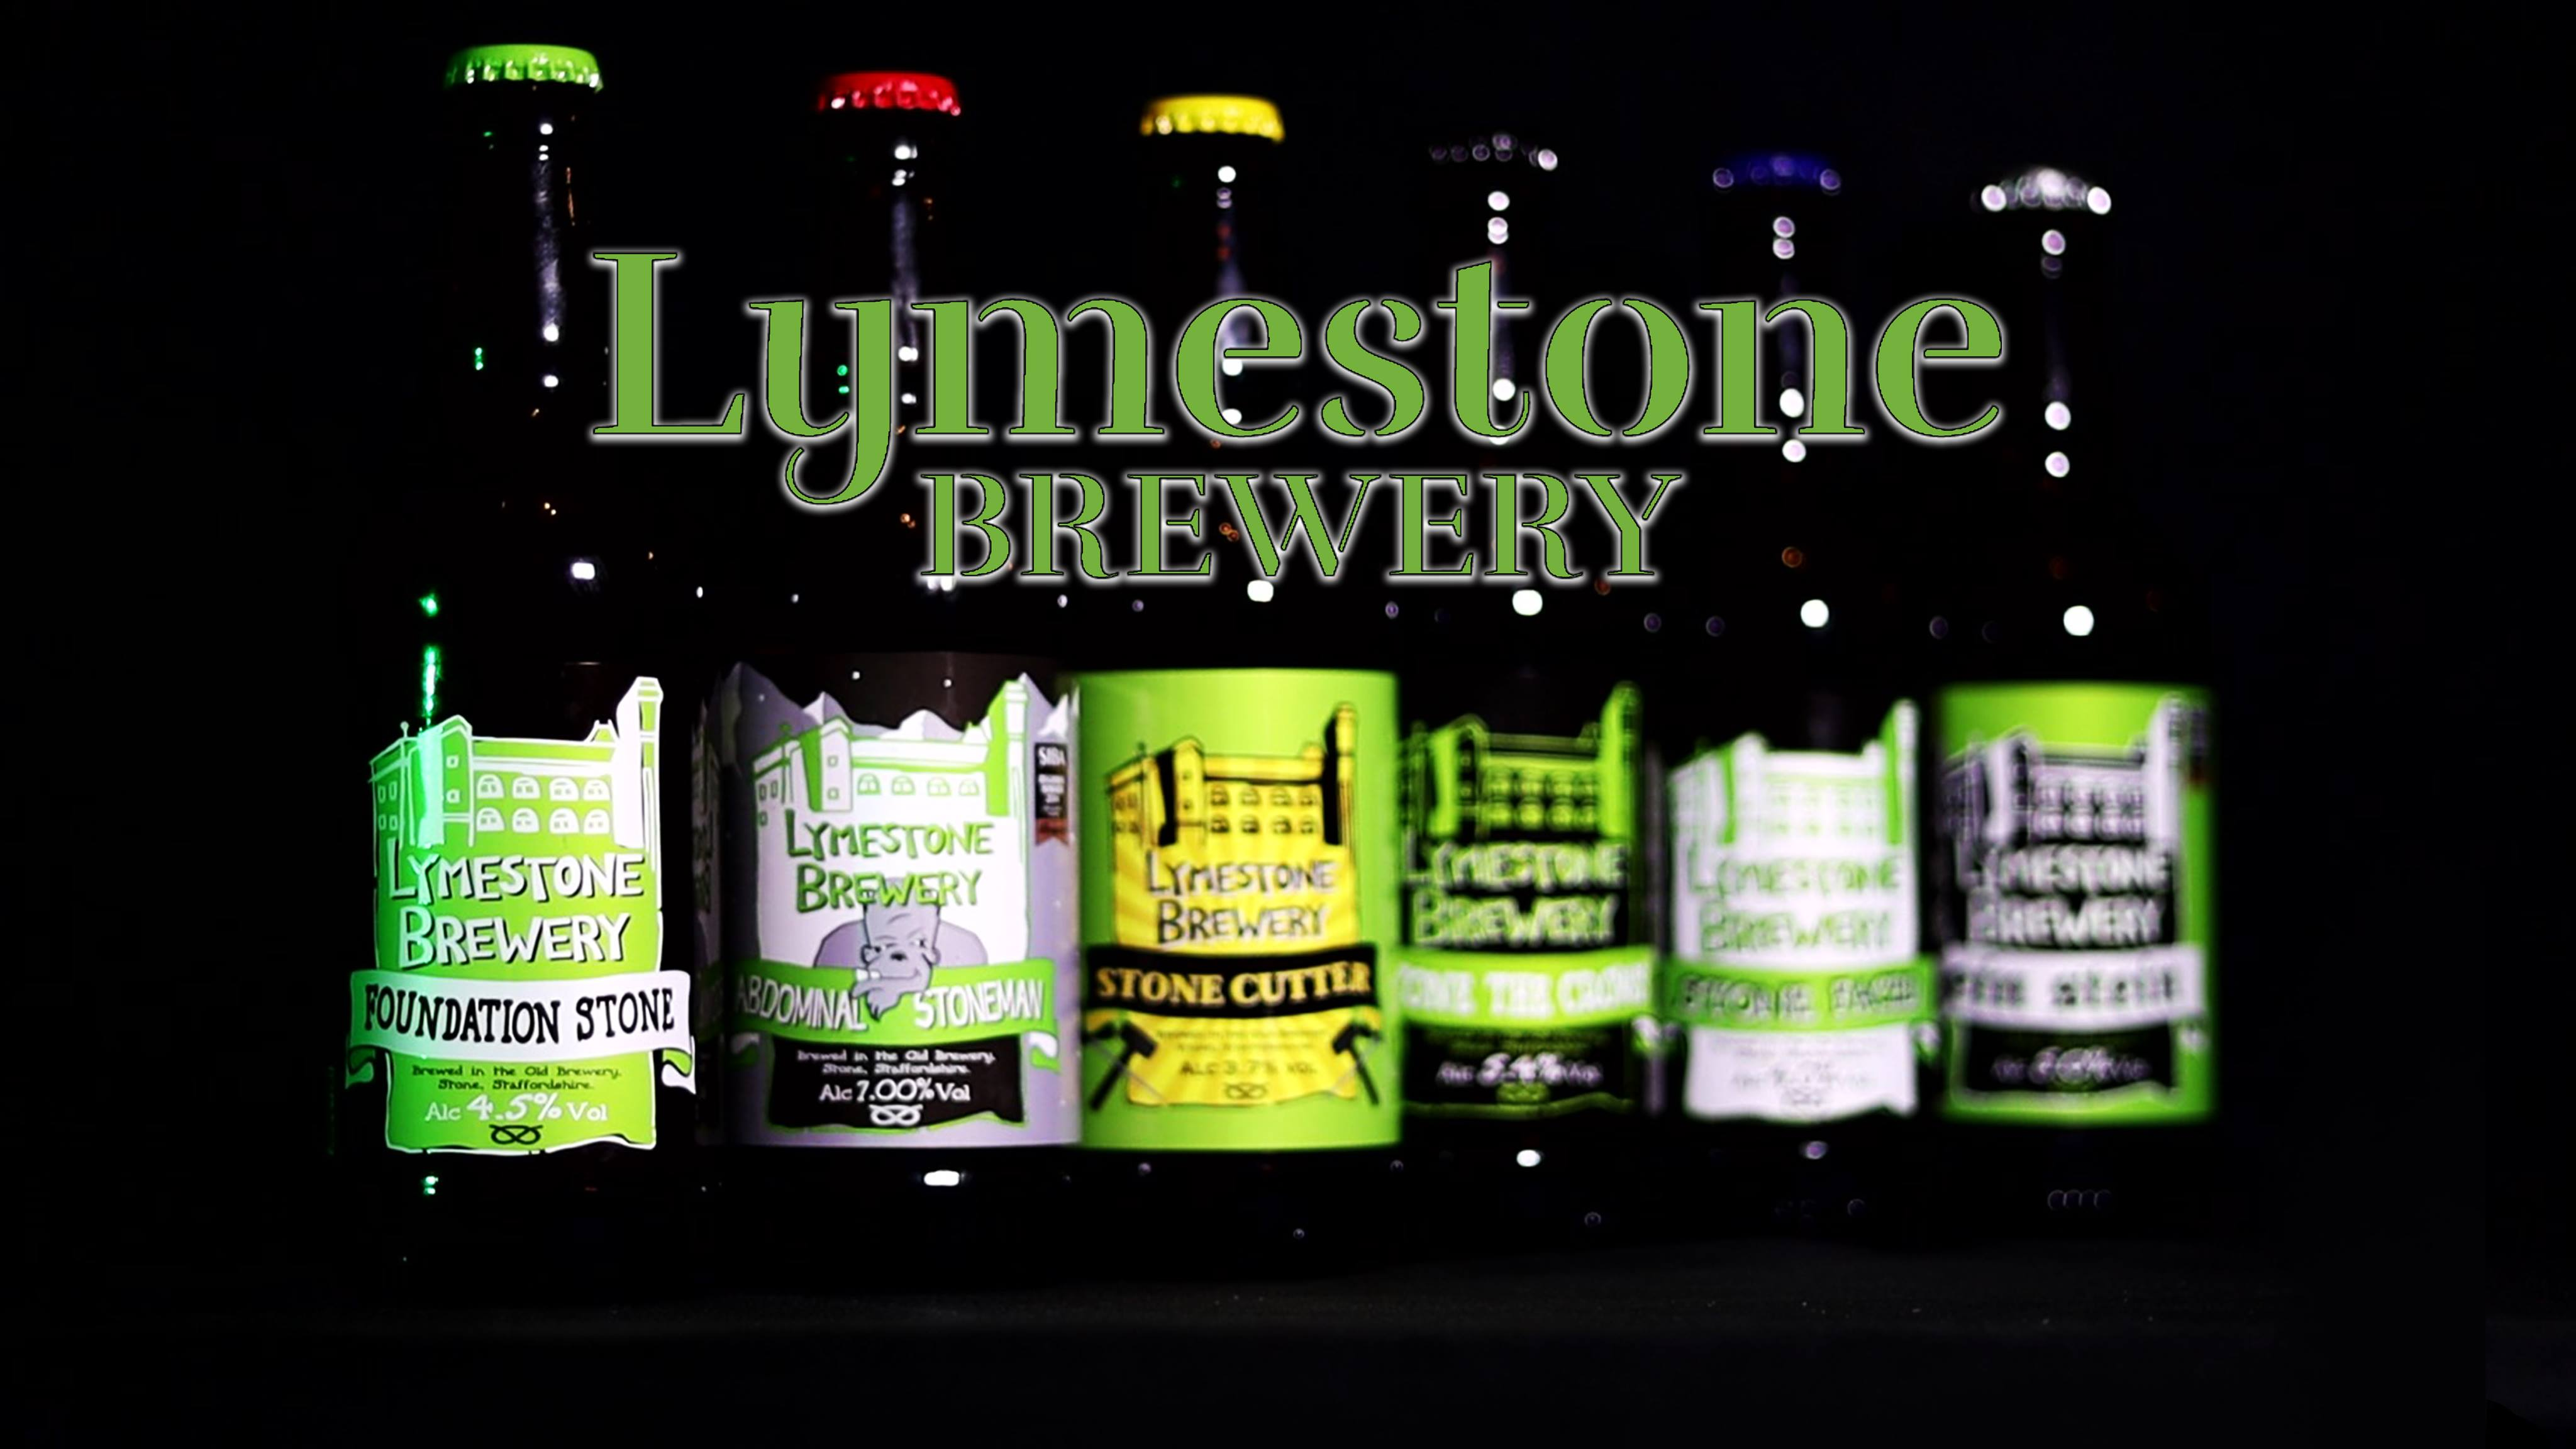 Lymestone Brewery